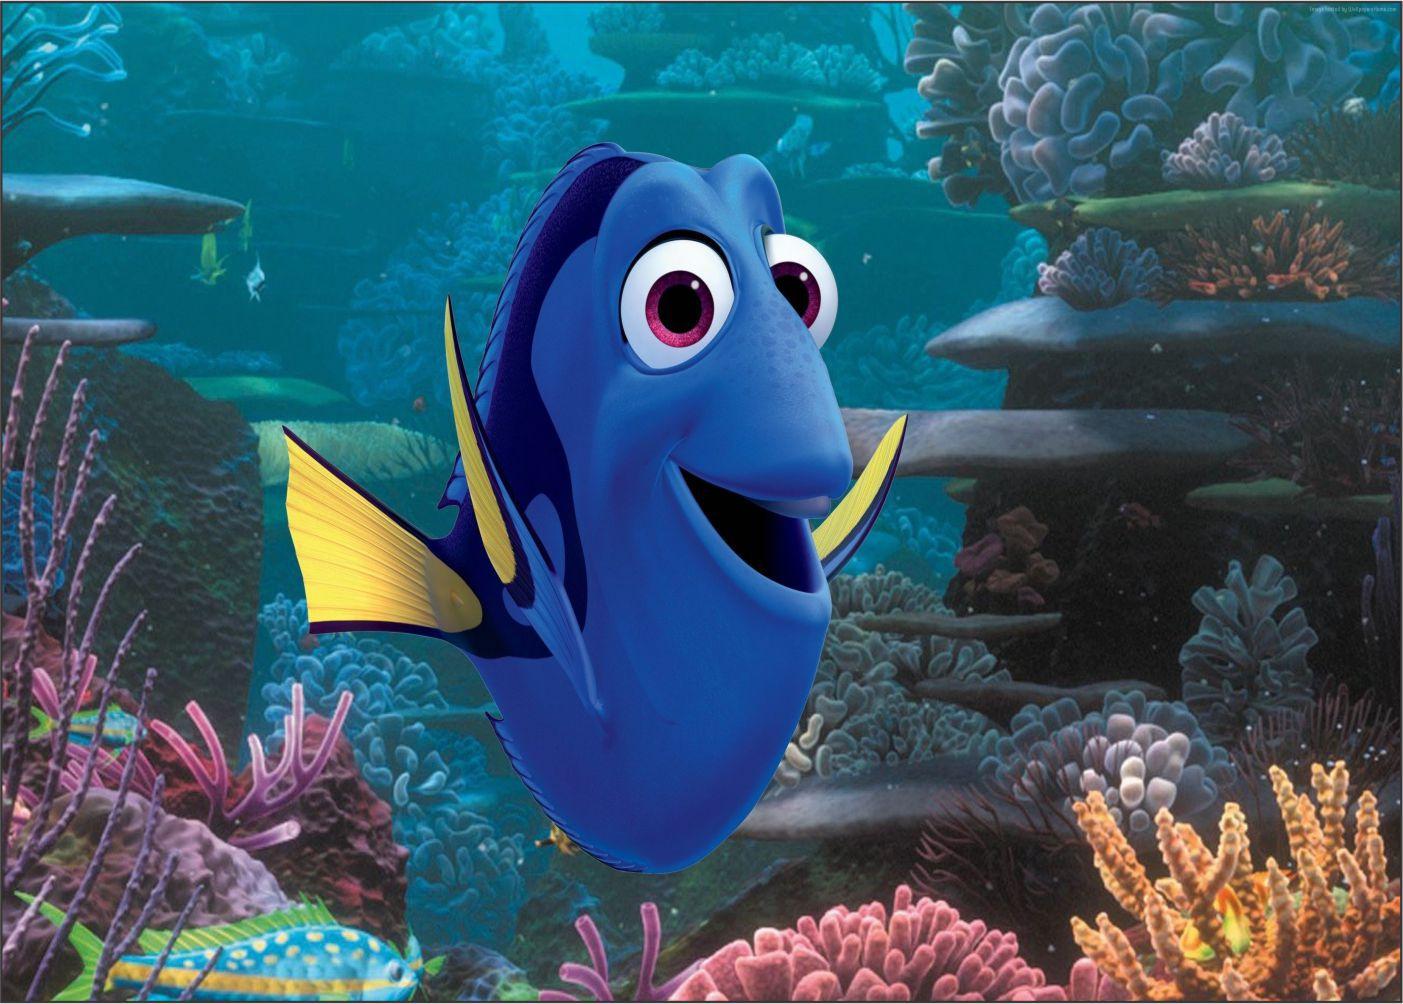 Papel de Parede 3D Nemo 0011 - Adesivos de Parede  - Paredes Decoradas